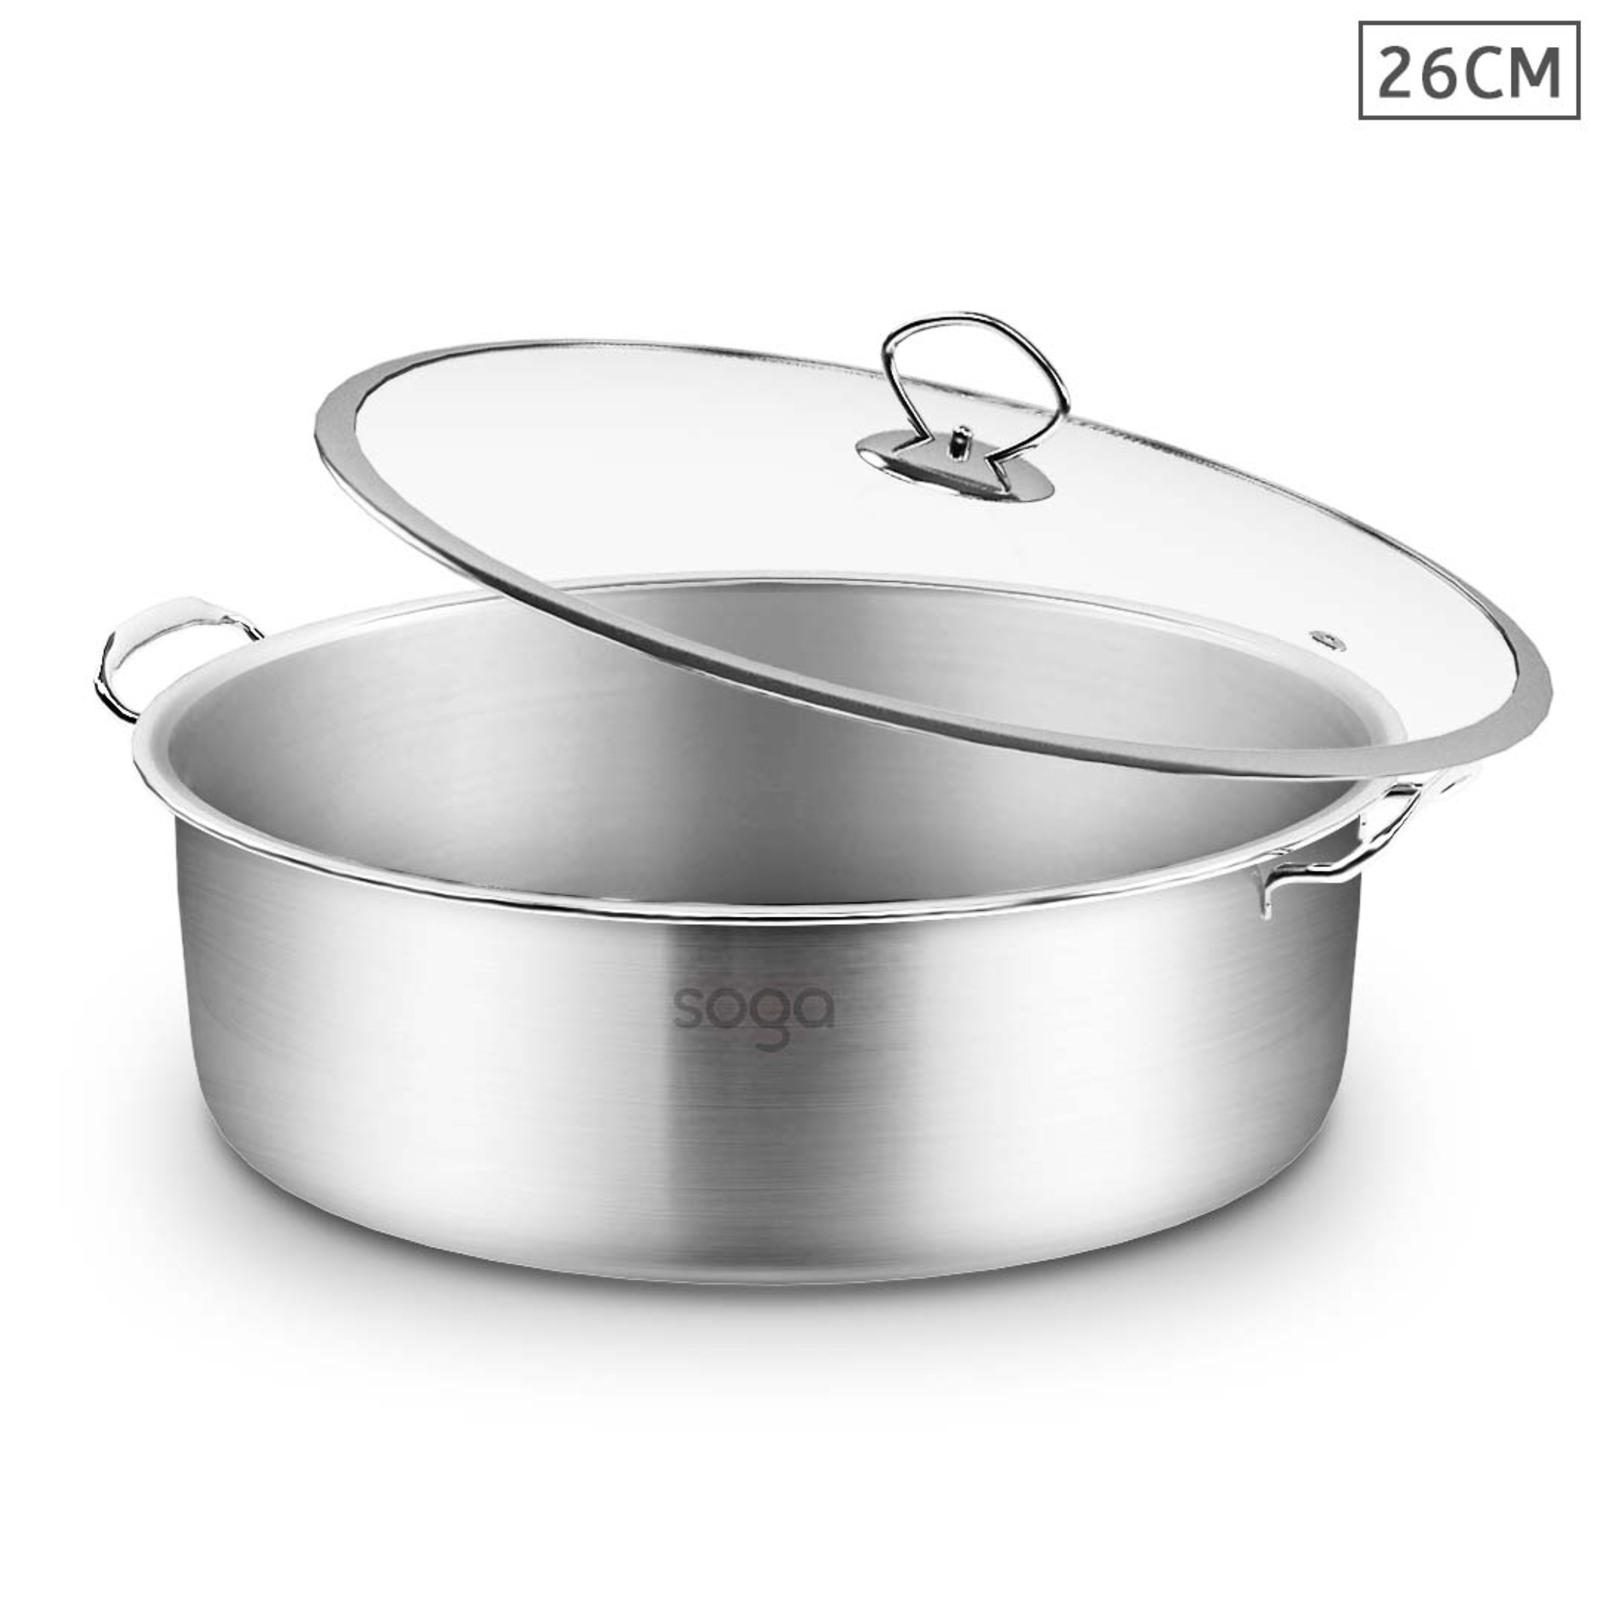 SOGA 26cm Stainless Steel Casserole